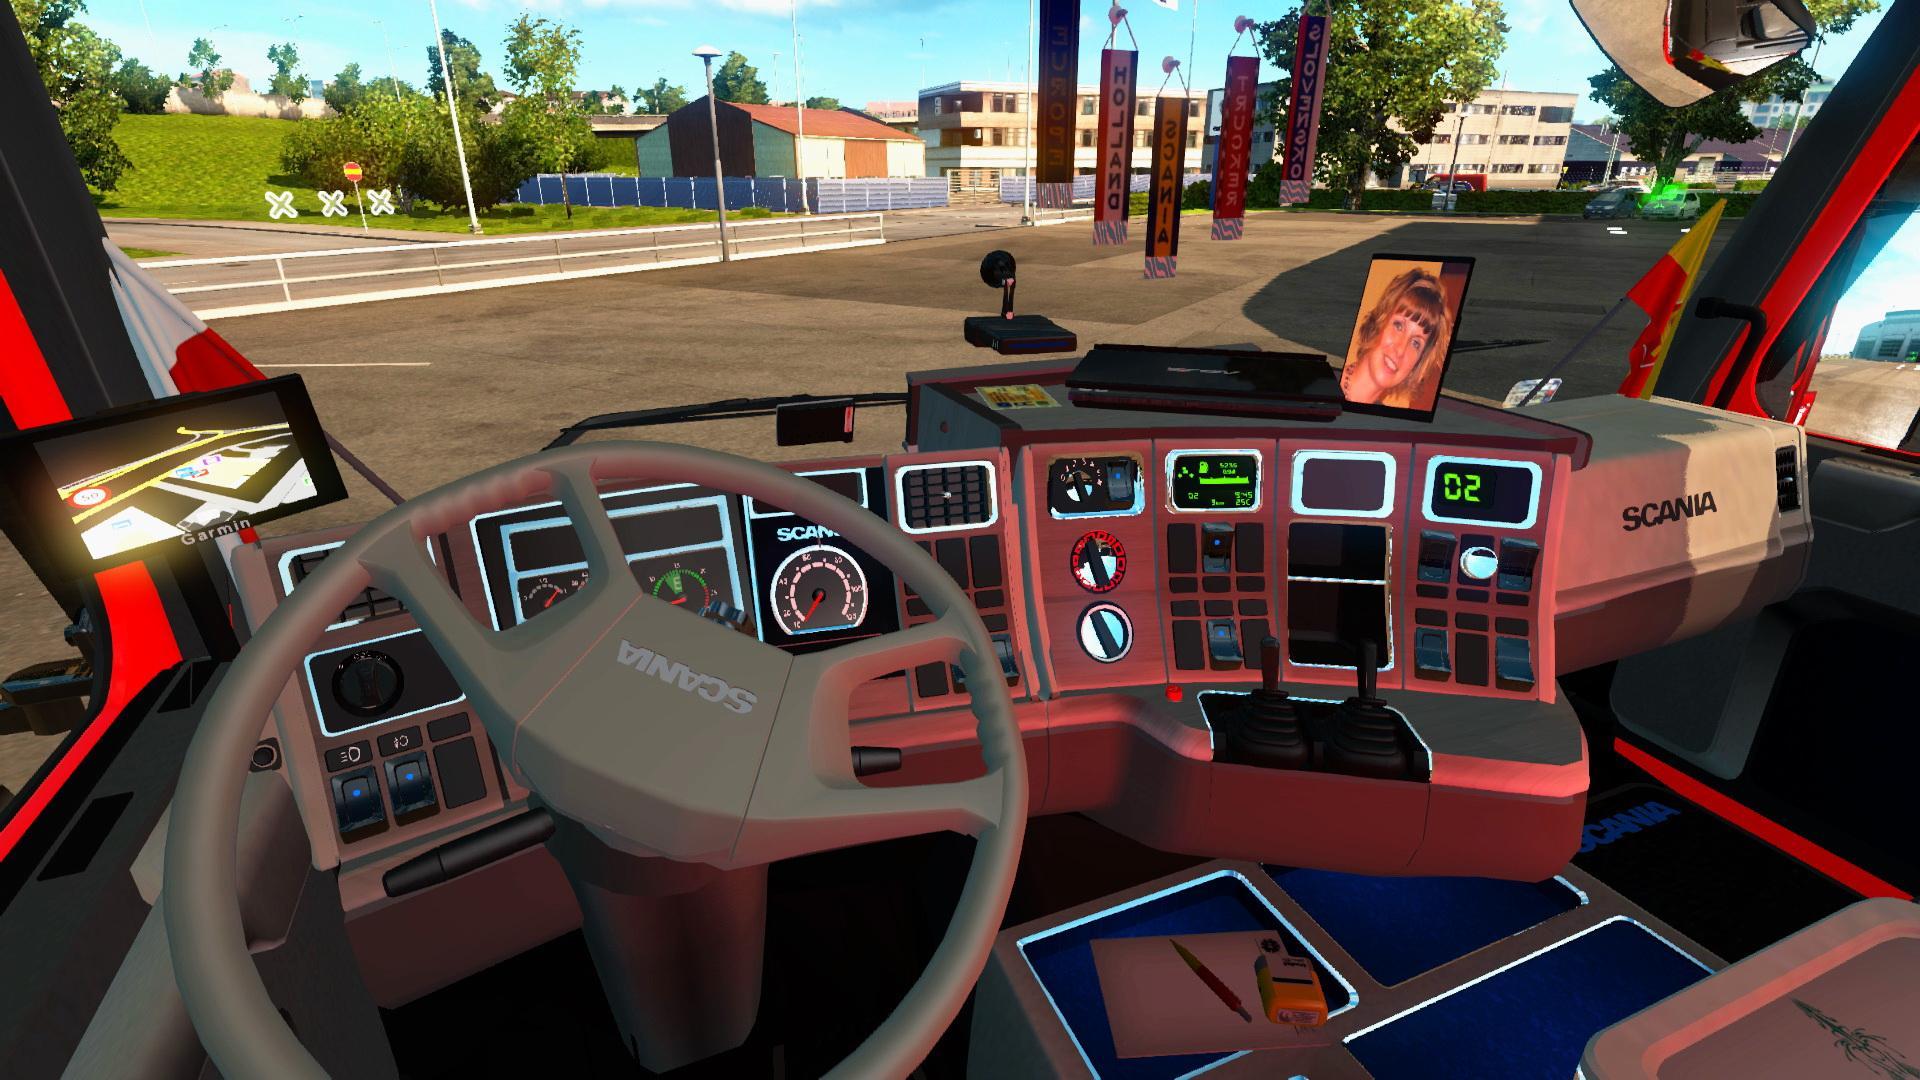 SCANIA 143M Truck + INTERIOR EDIT BY EKUALIZER V3.3 -Euro Truck Simulator 2 Mods